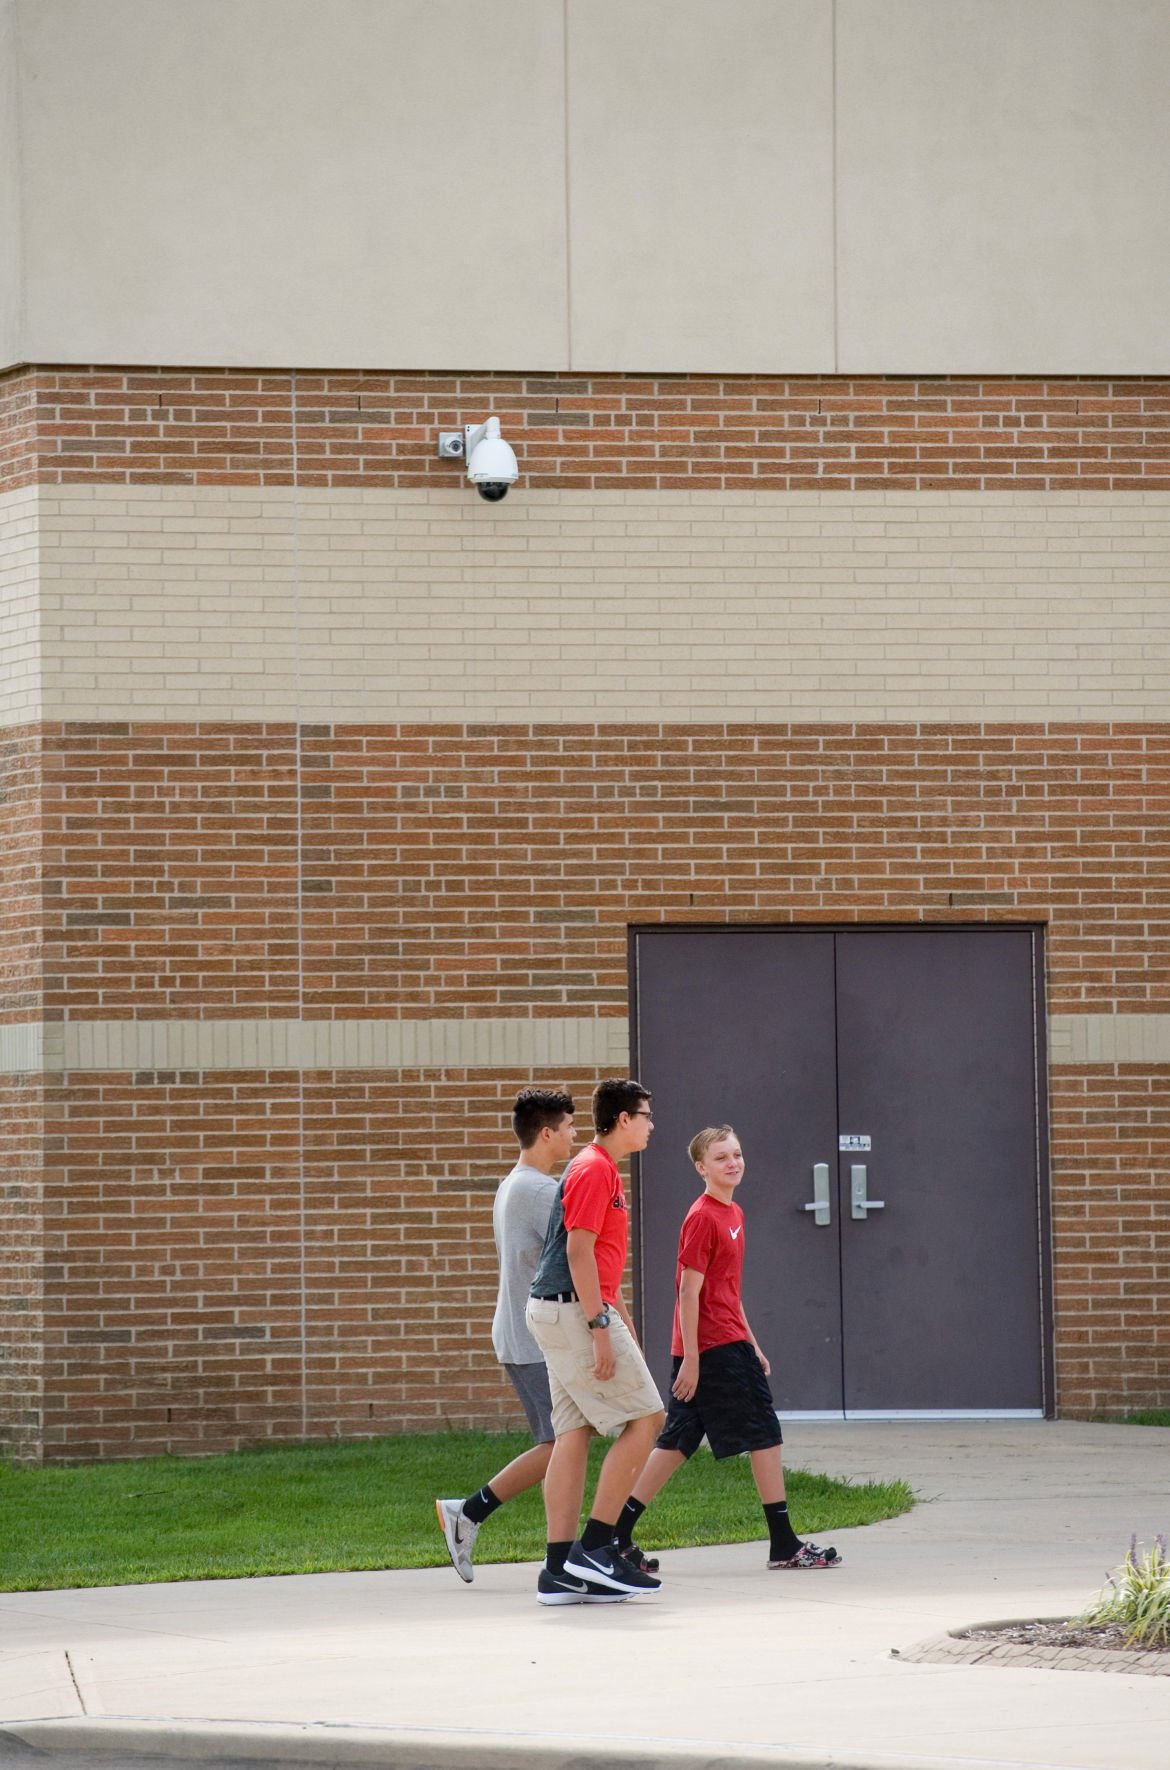 Mattoon School Security 08/10/18 (1)